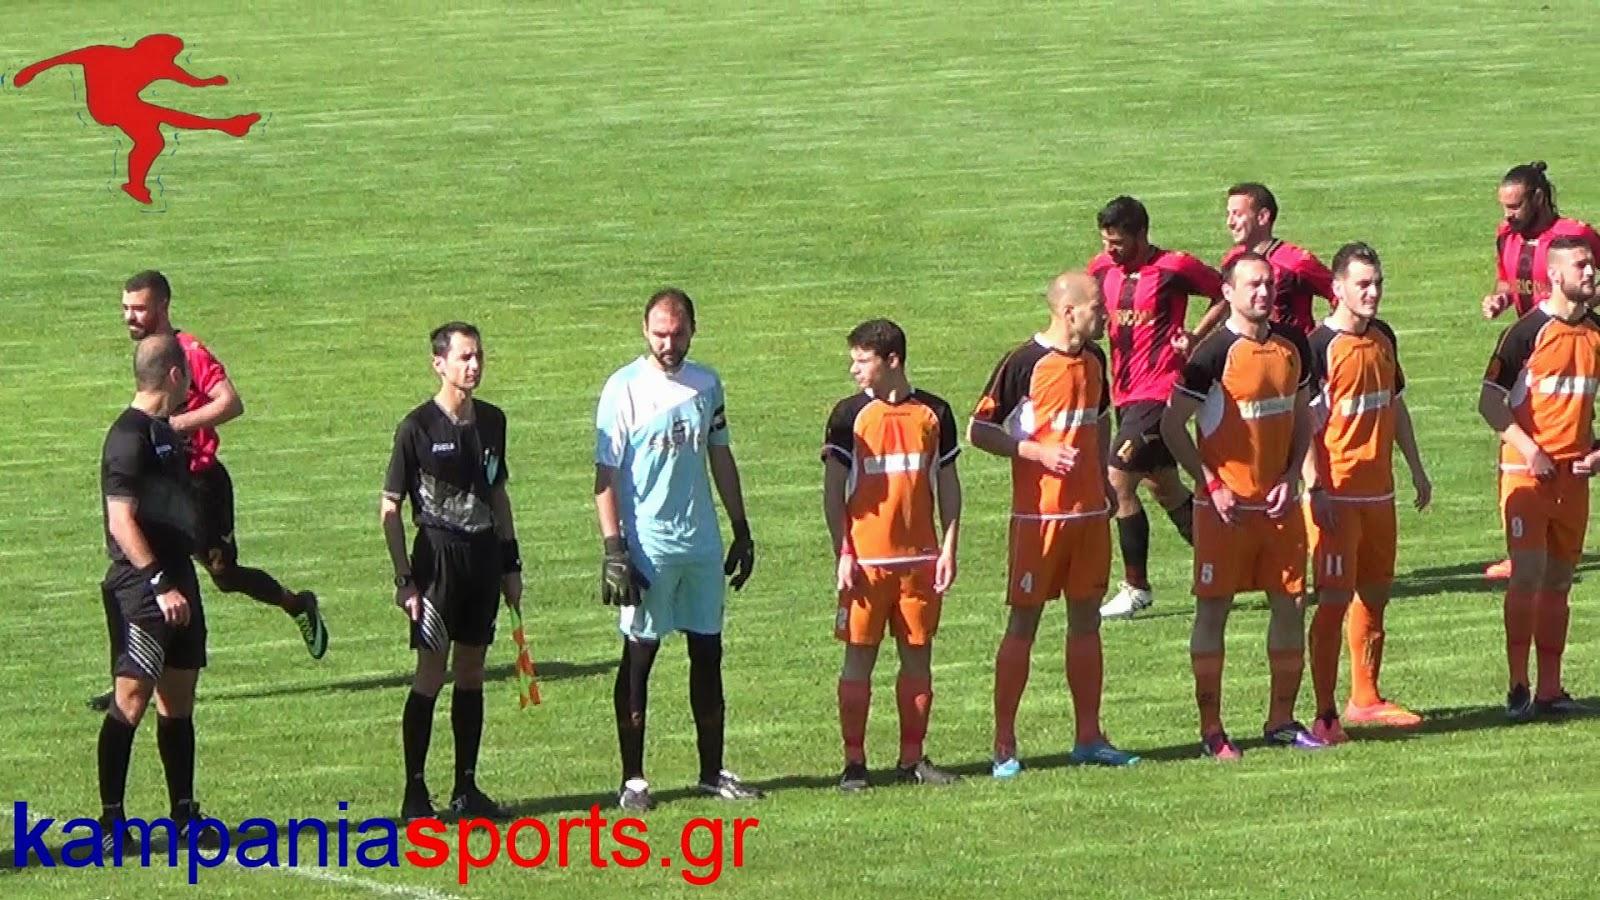 Kampaniasports.gr